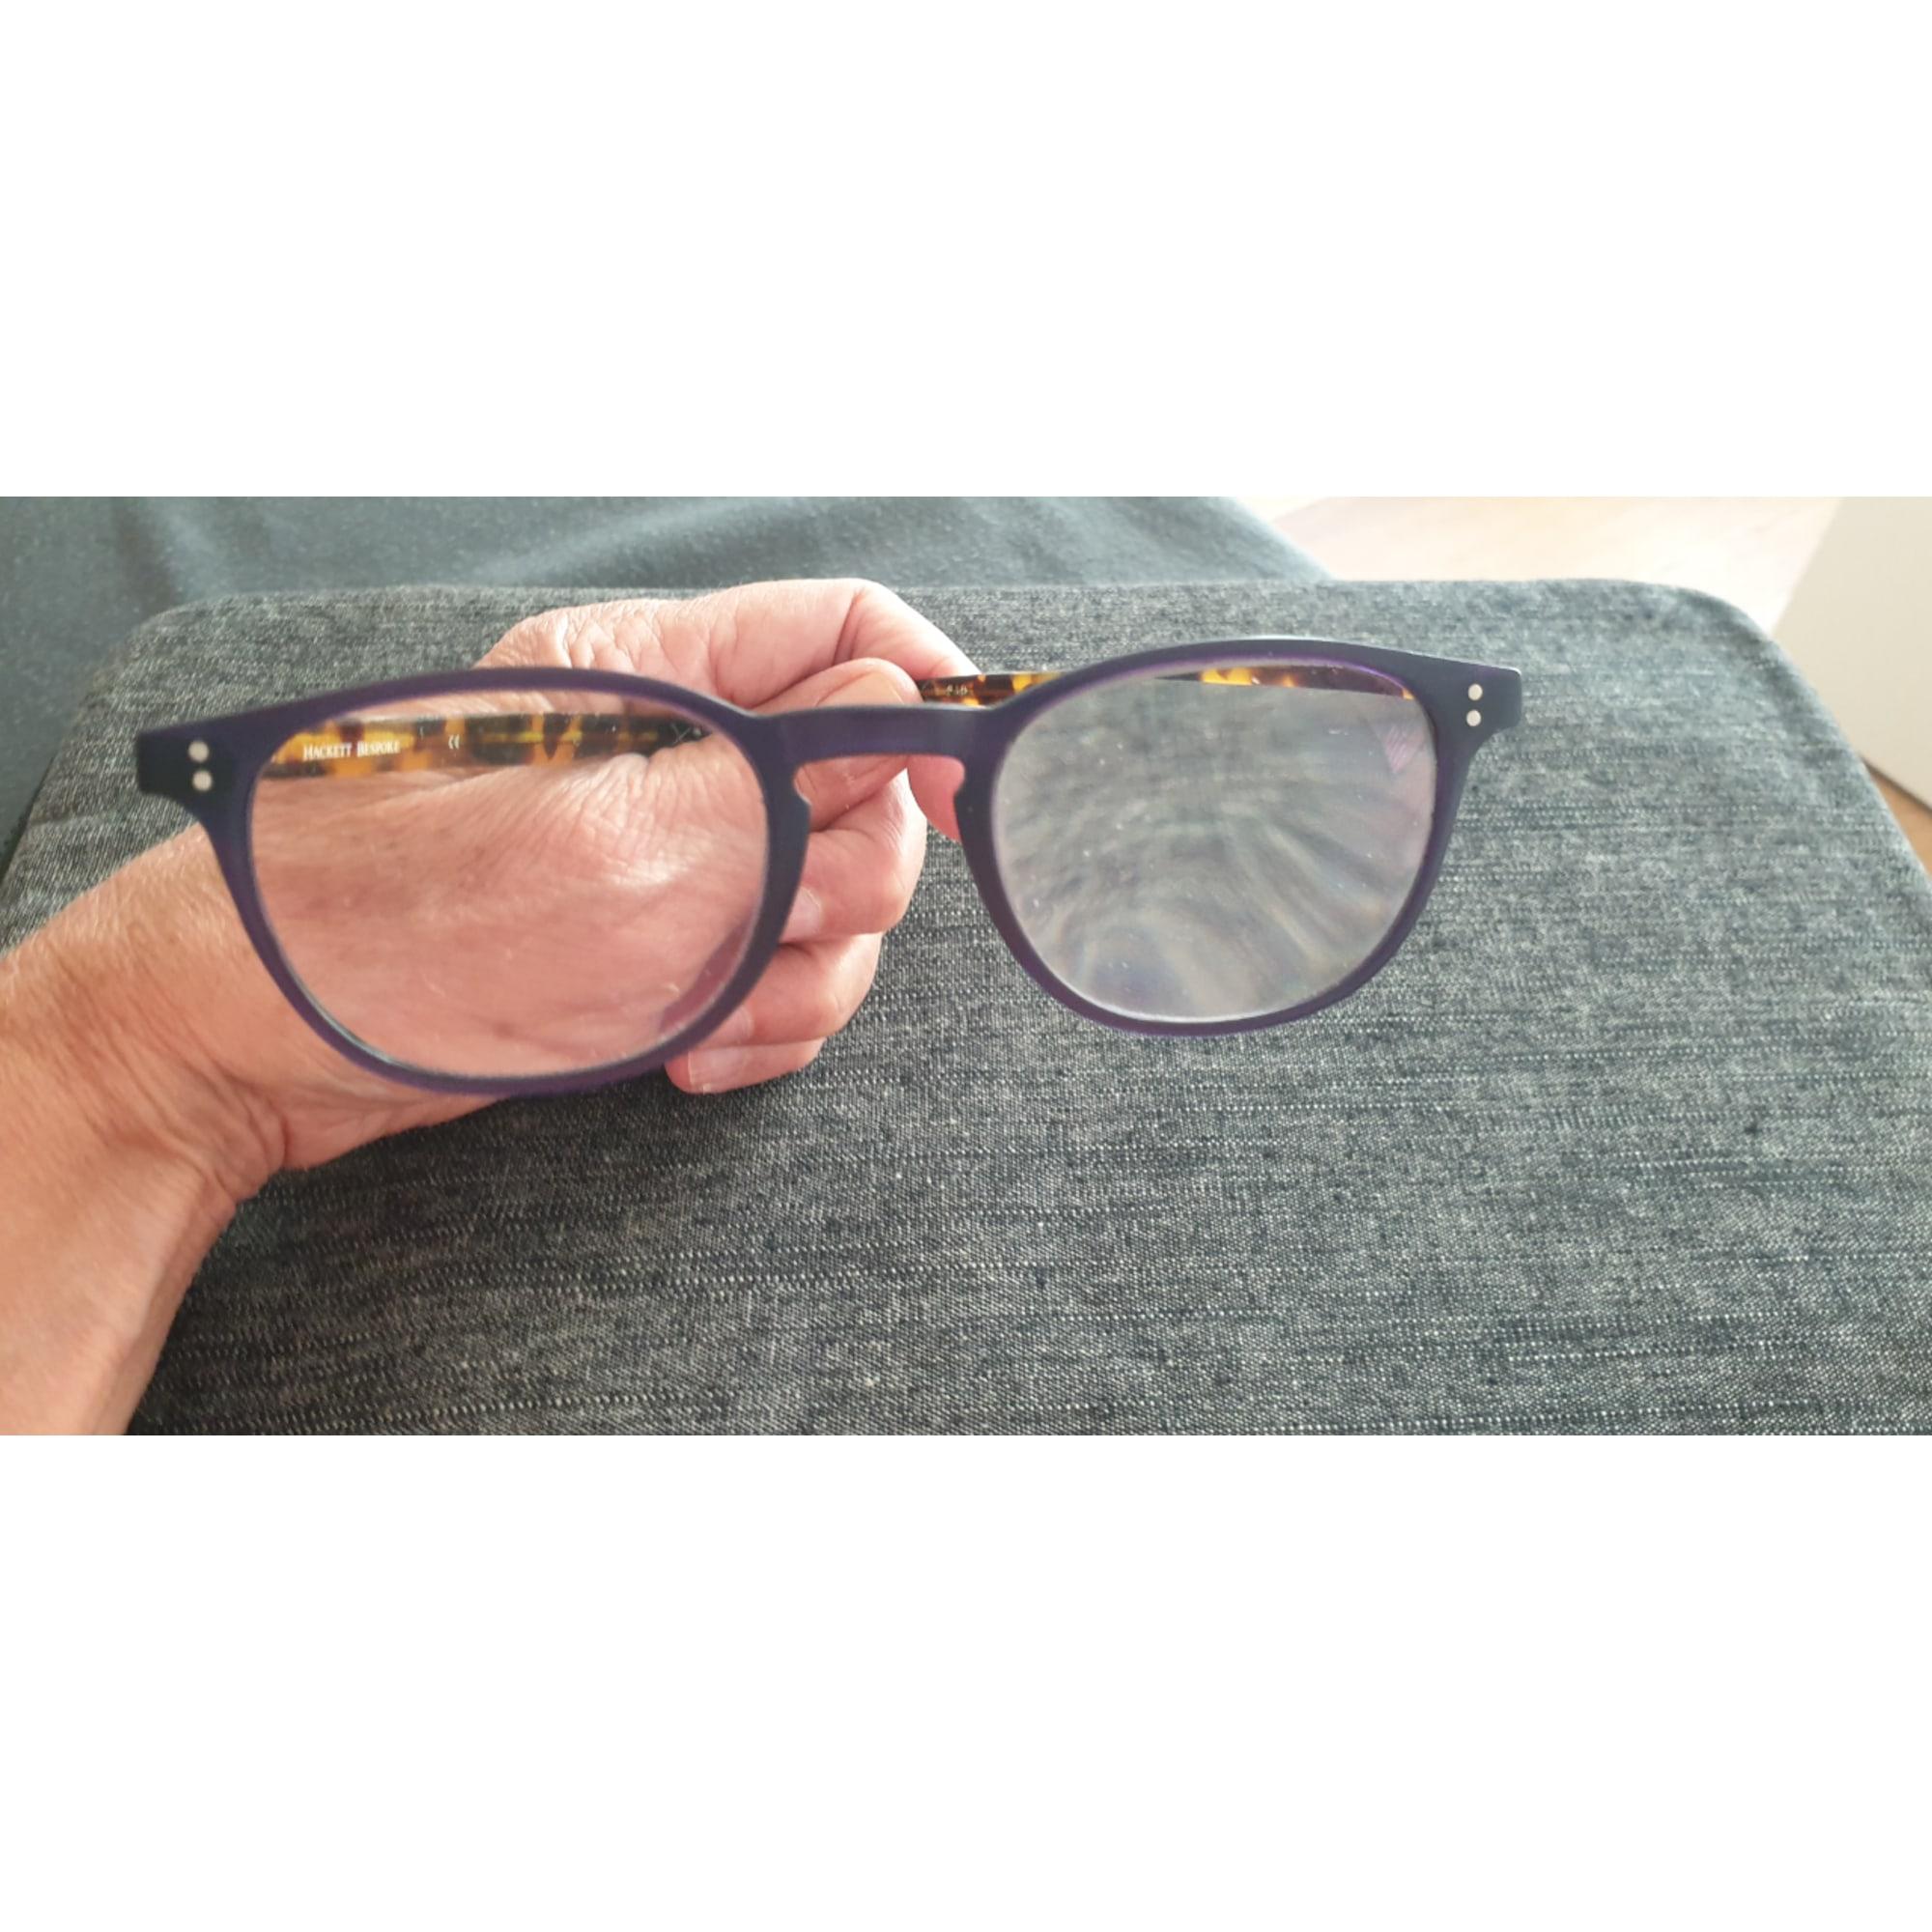 Eyeglass Frames HACKETT Blue, navy, turquoise